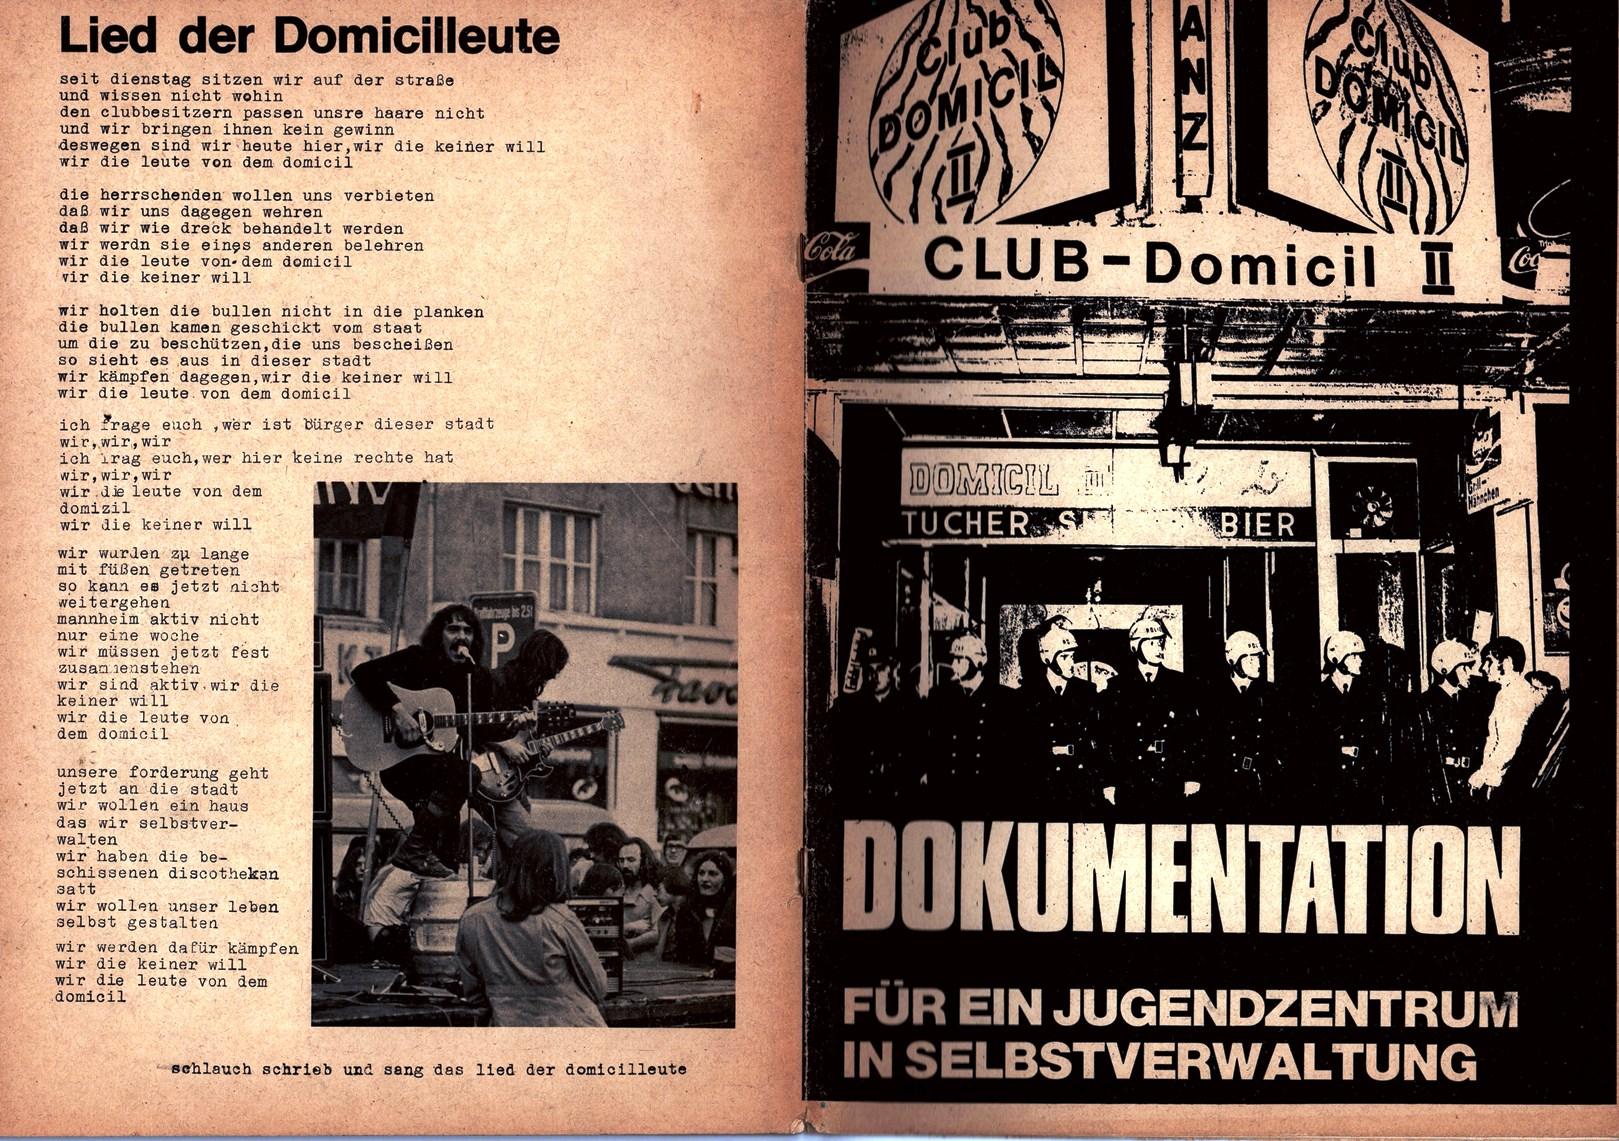 Mannheim_Jugendzentrum001